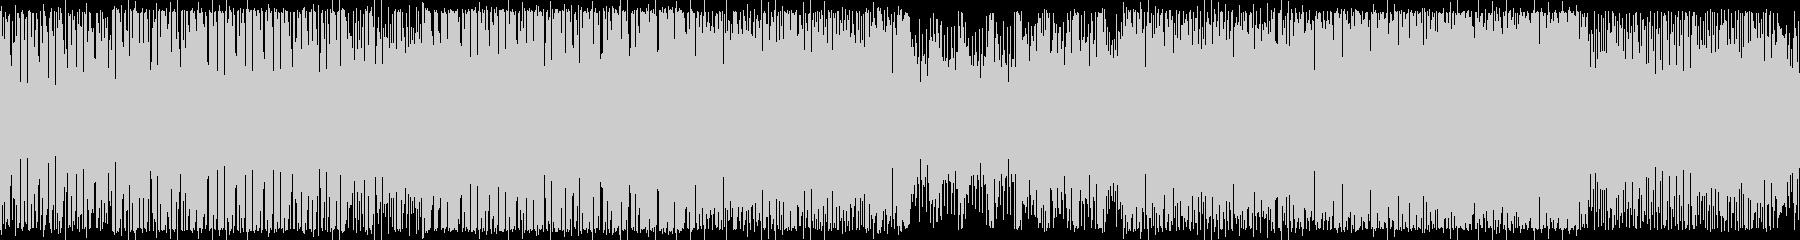 BPM150:ワークアウト:ループ版の未再生の波形